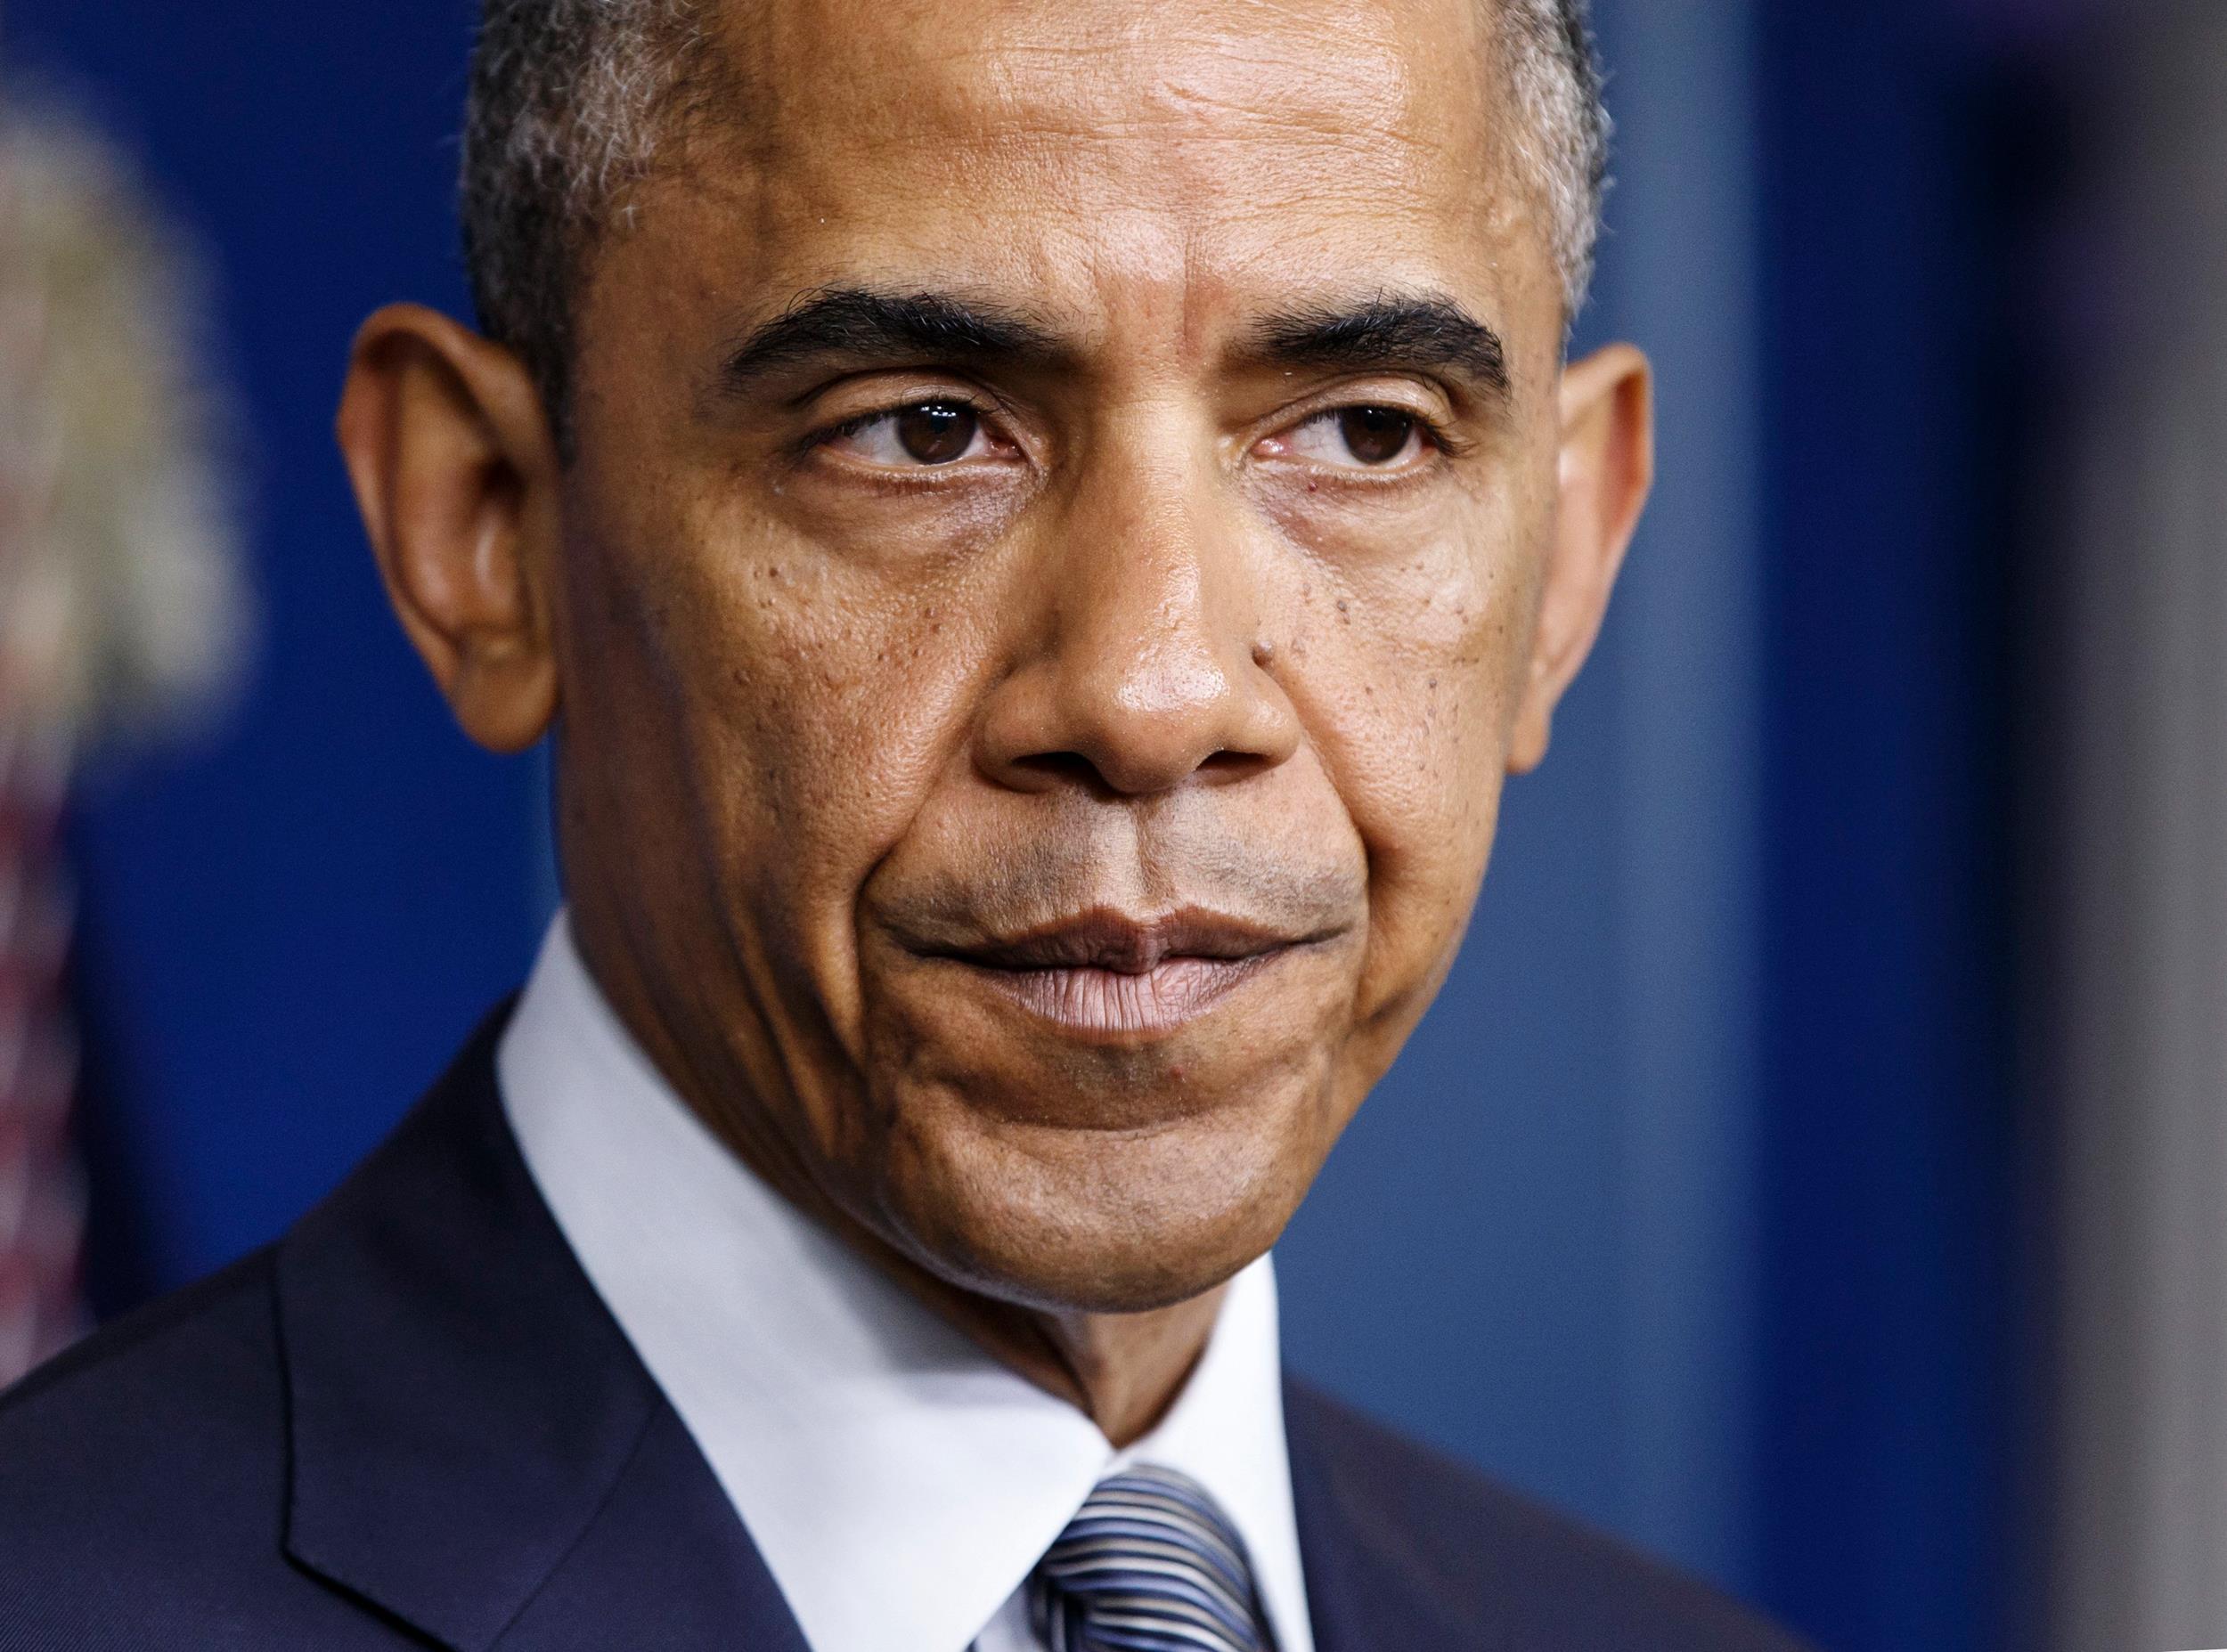 Obama Wallpapers High Resolution and Quality DownloadBarack Obama 2500x1855